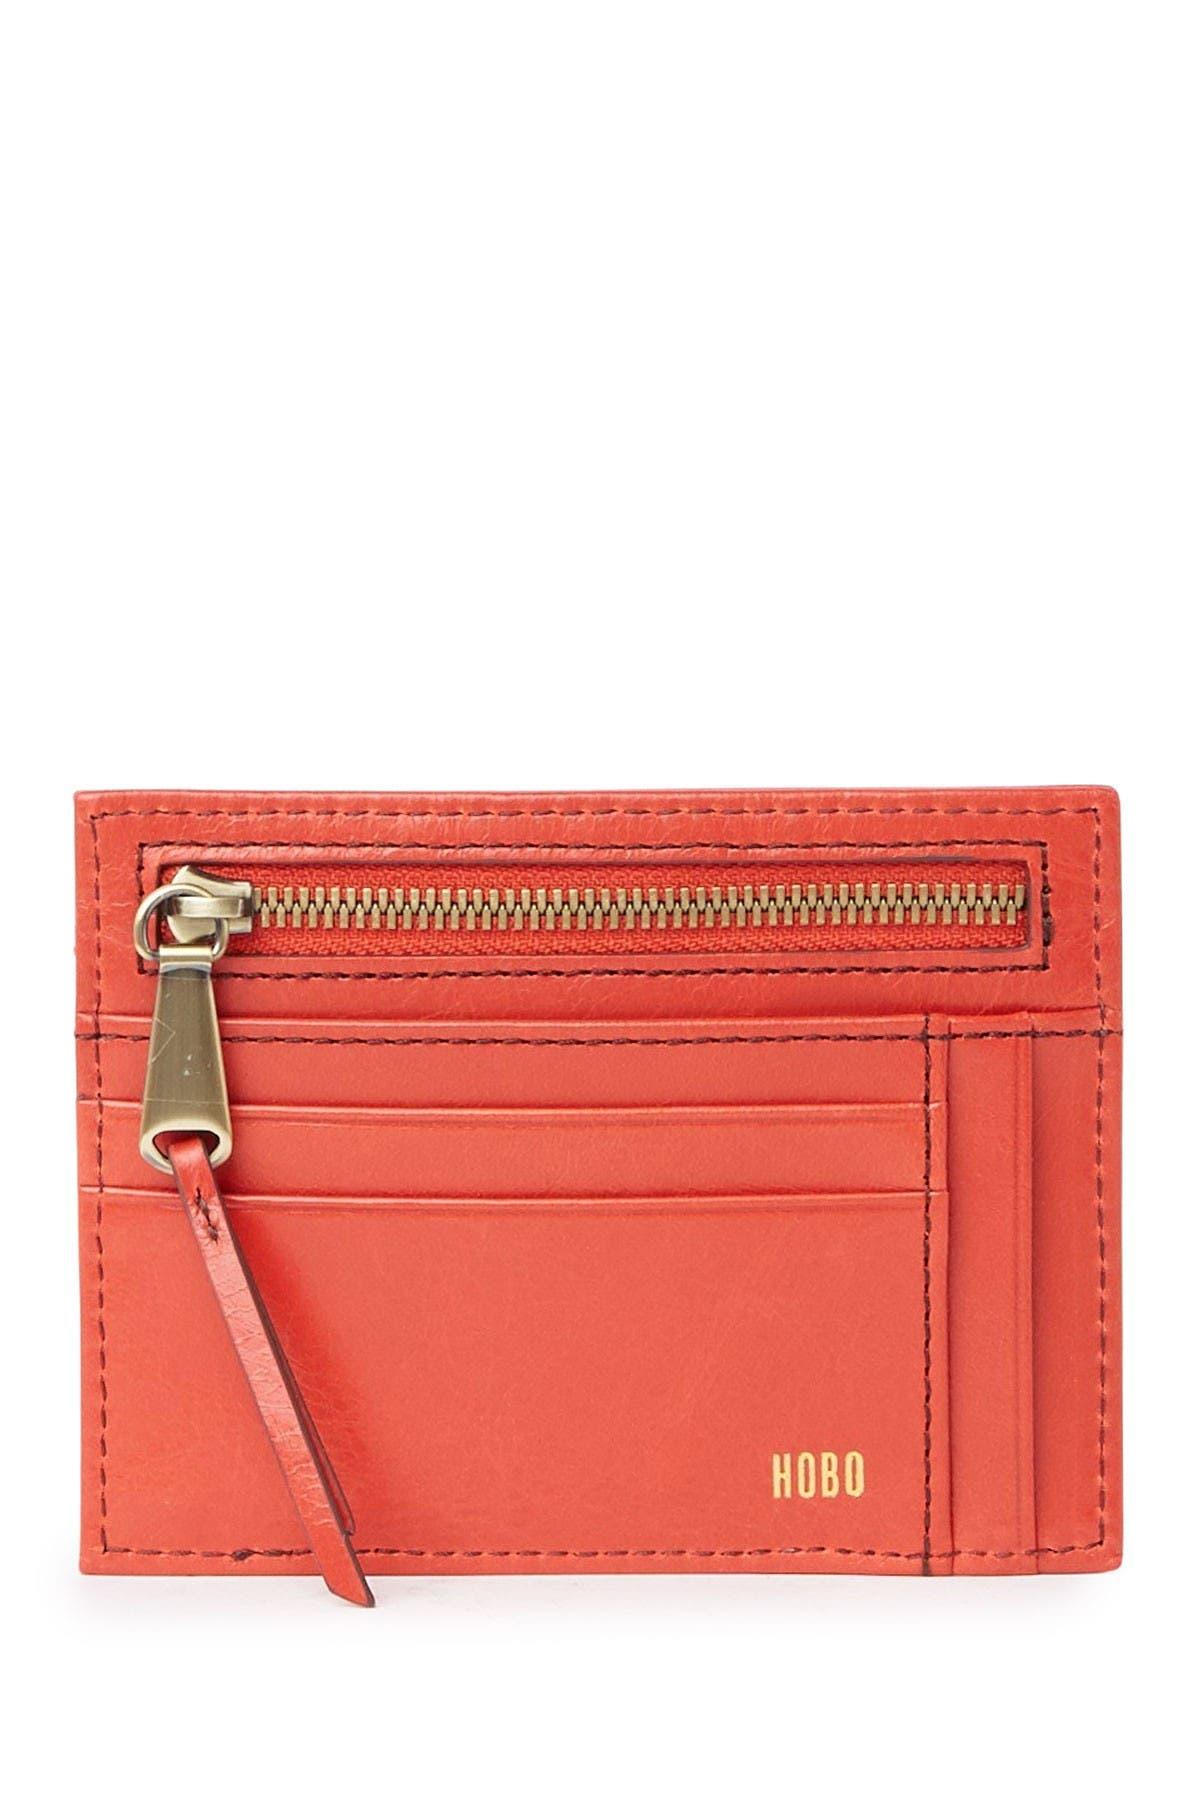 Image of Hobo Brink Leather Card Case